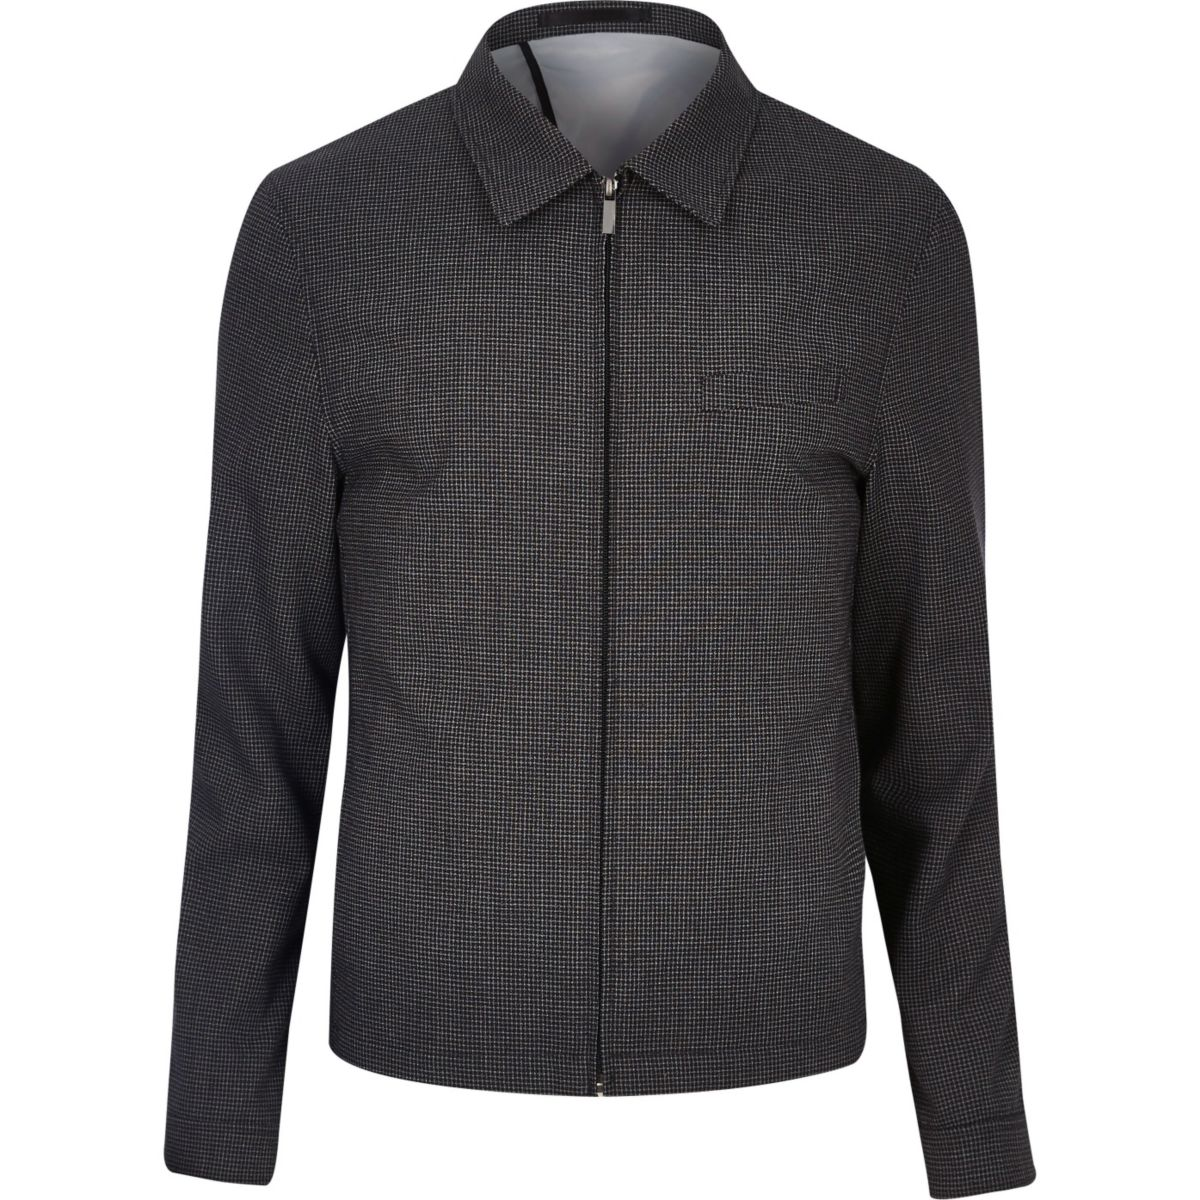 Black gingham skinny suit jacket